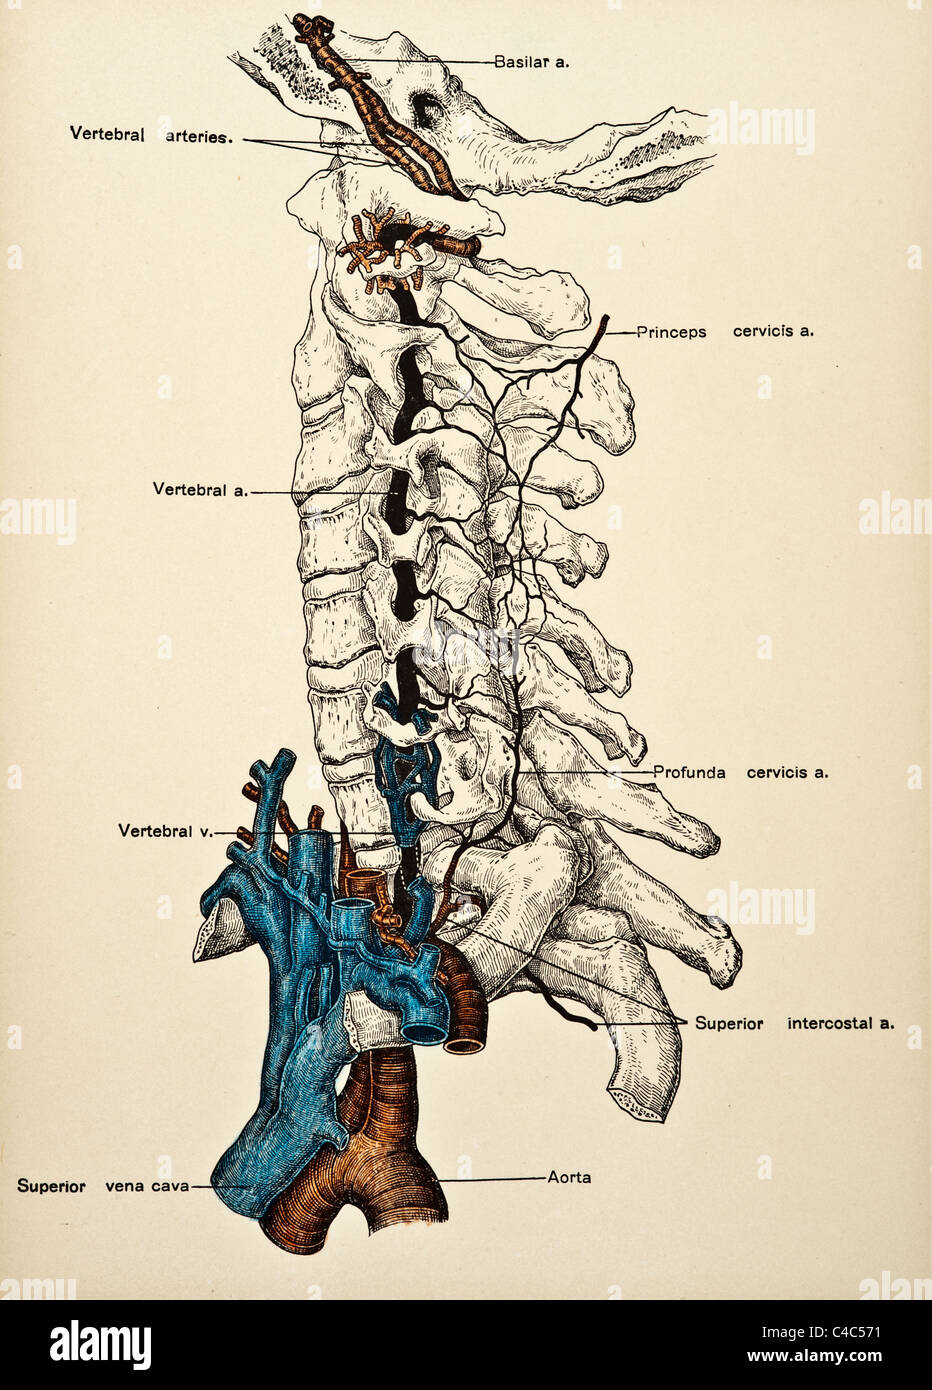 Neck And Head Arteries Stockfotos & Neck And Head Arteries Bilder ...